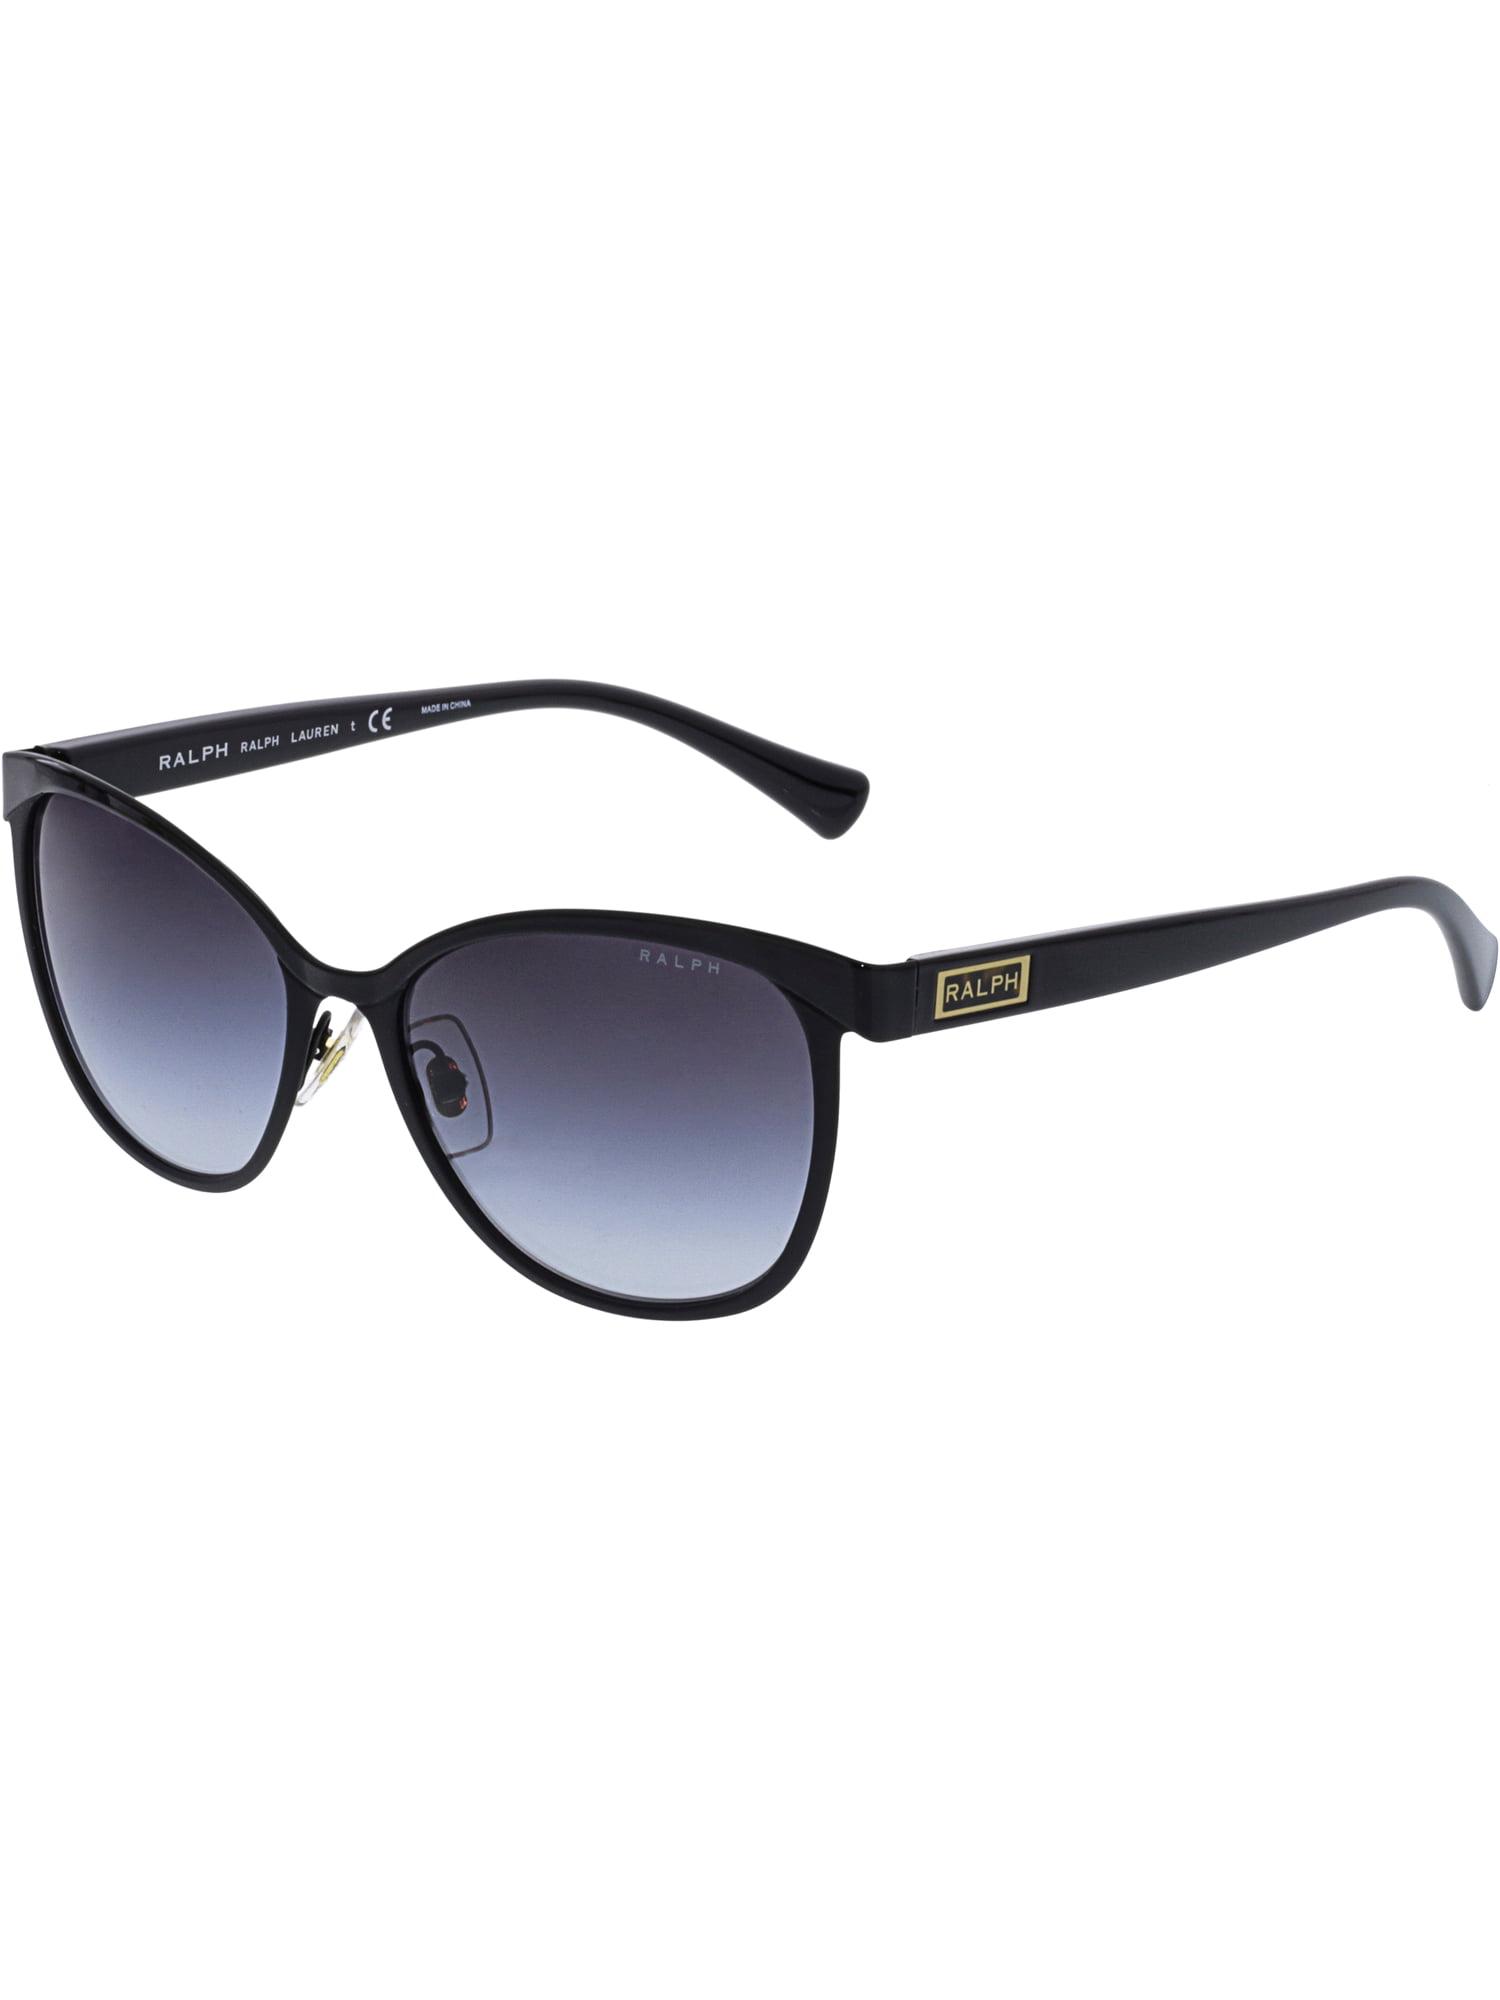 Ralph By Ralph Lauren Metal Cateye Sunglasses in Black RA4118 31808G 54 Ralph Lauren Cheap Pre Order mhK5F